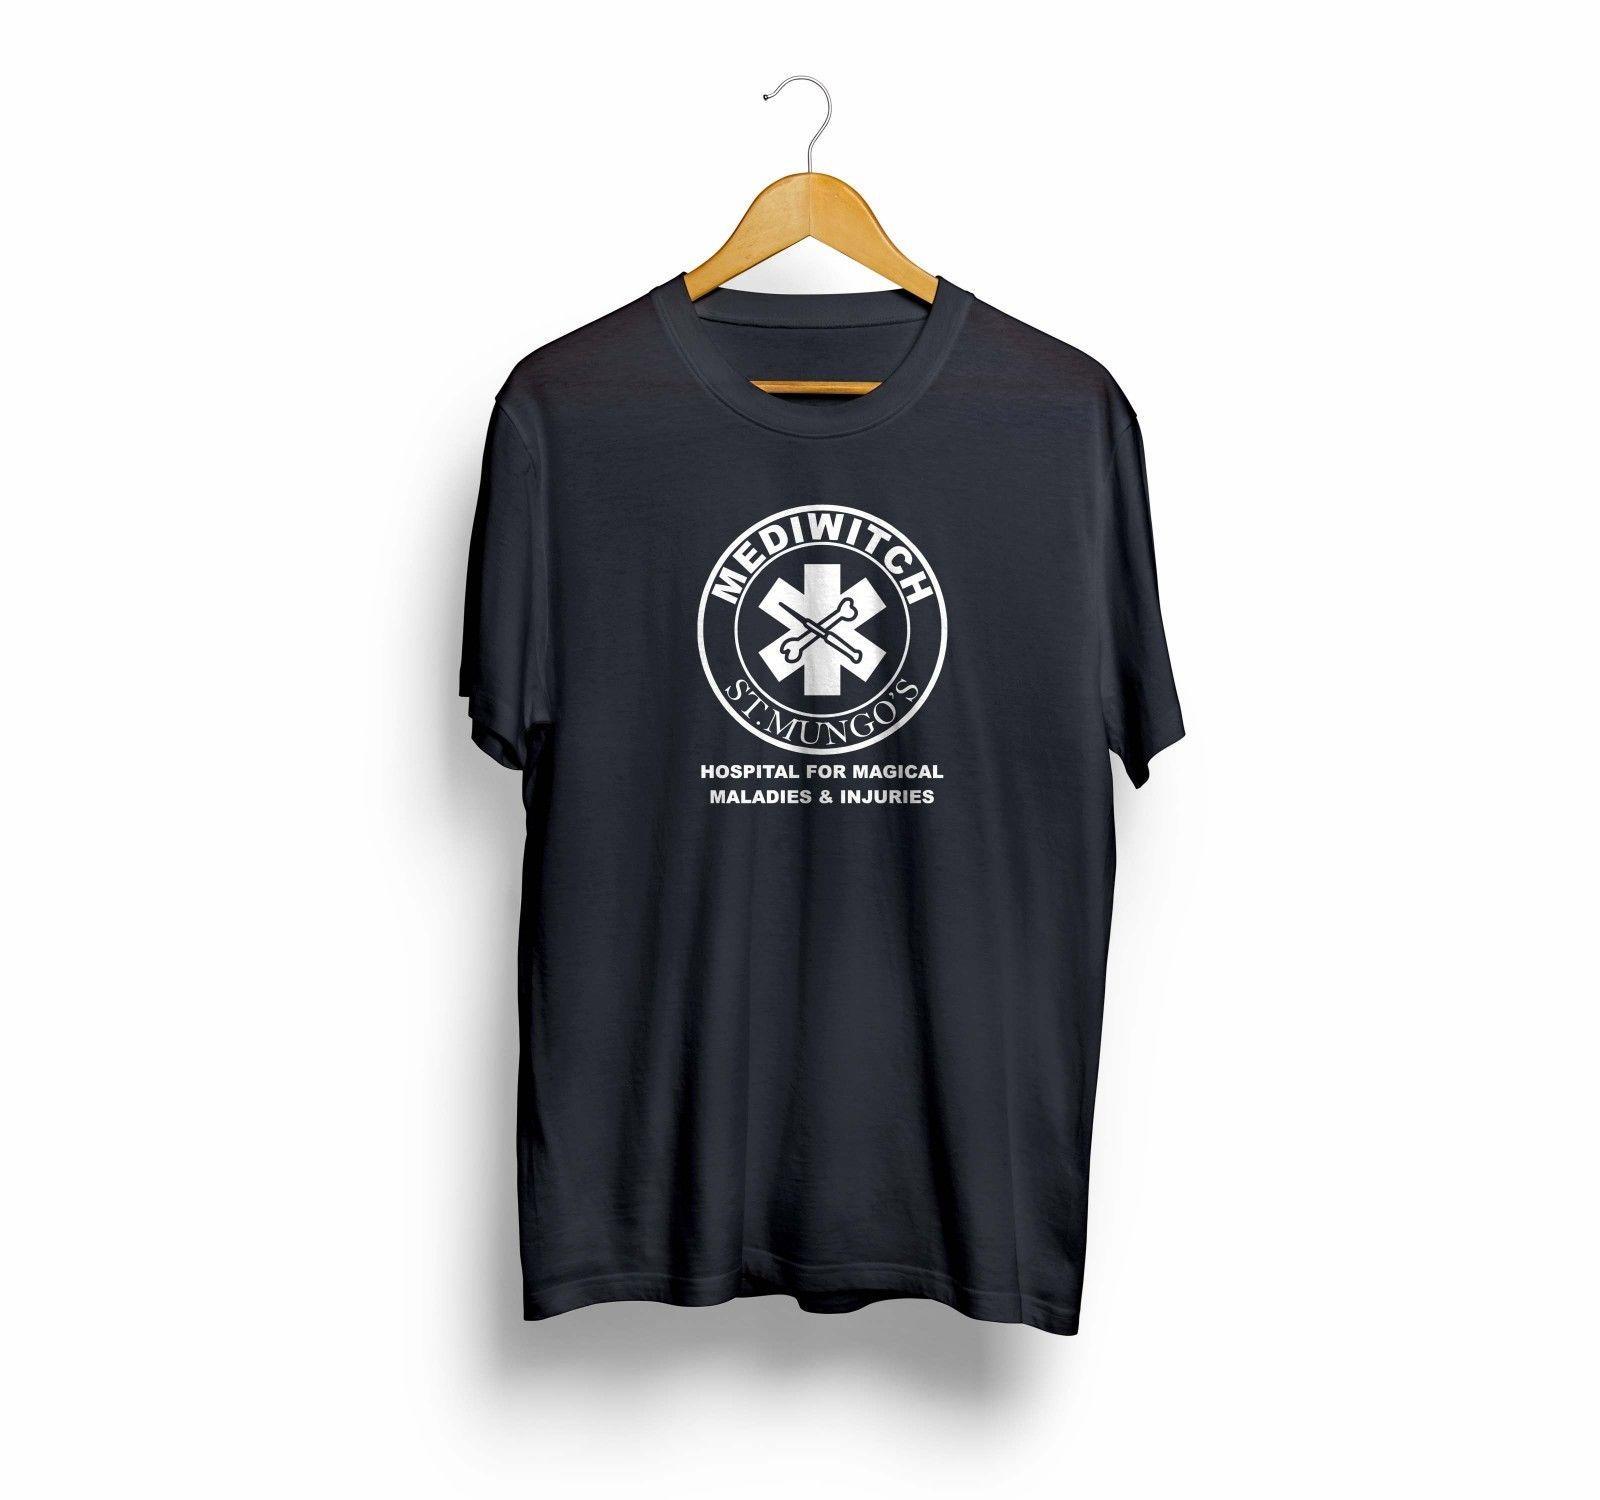 4047a810d24 Harry Potter Nurse Doctor Gift For Harry Potter Men & Women T Shirt T Shirt  Tees Funny T Shirt Men Tees Men 100% Cotton High Quality Tops Cool Tee  Shirts ...